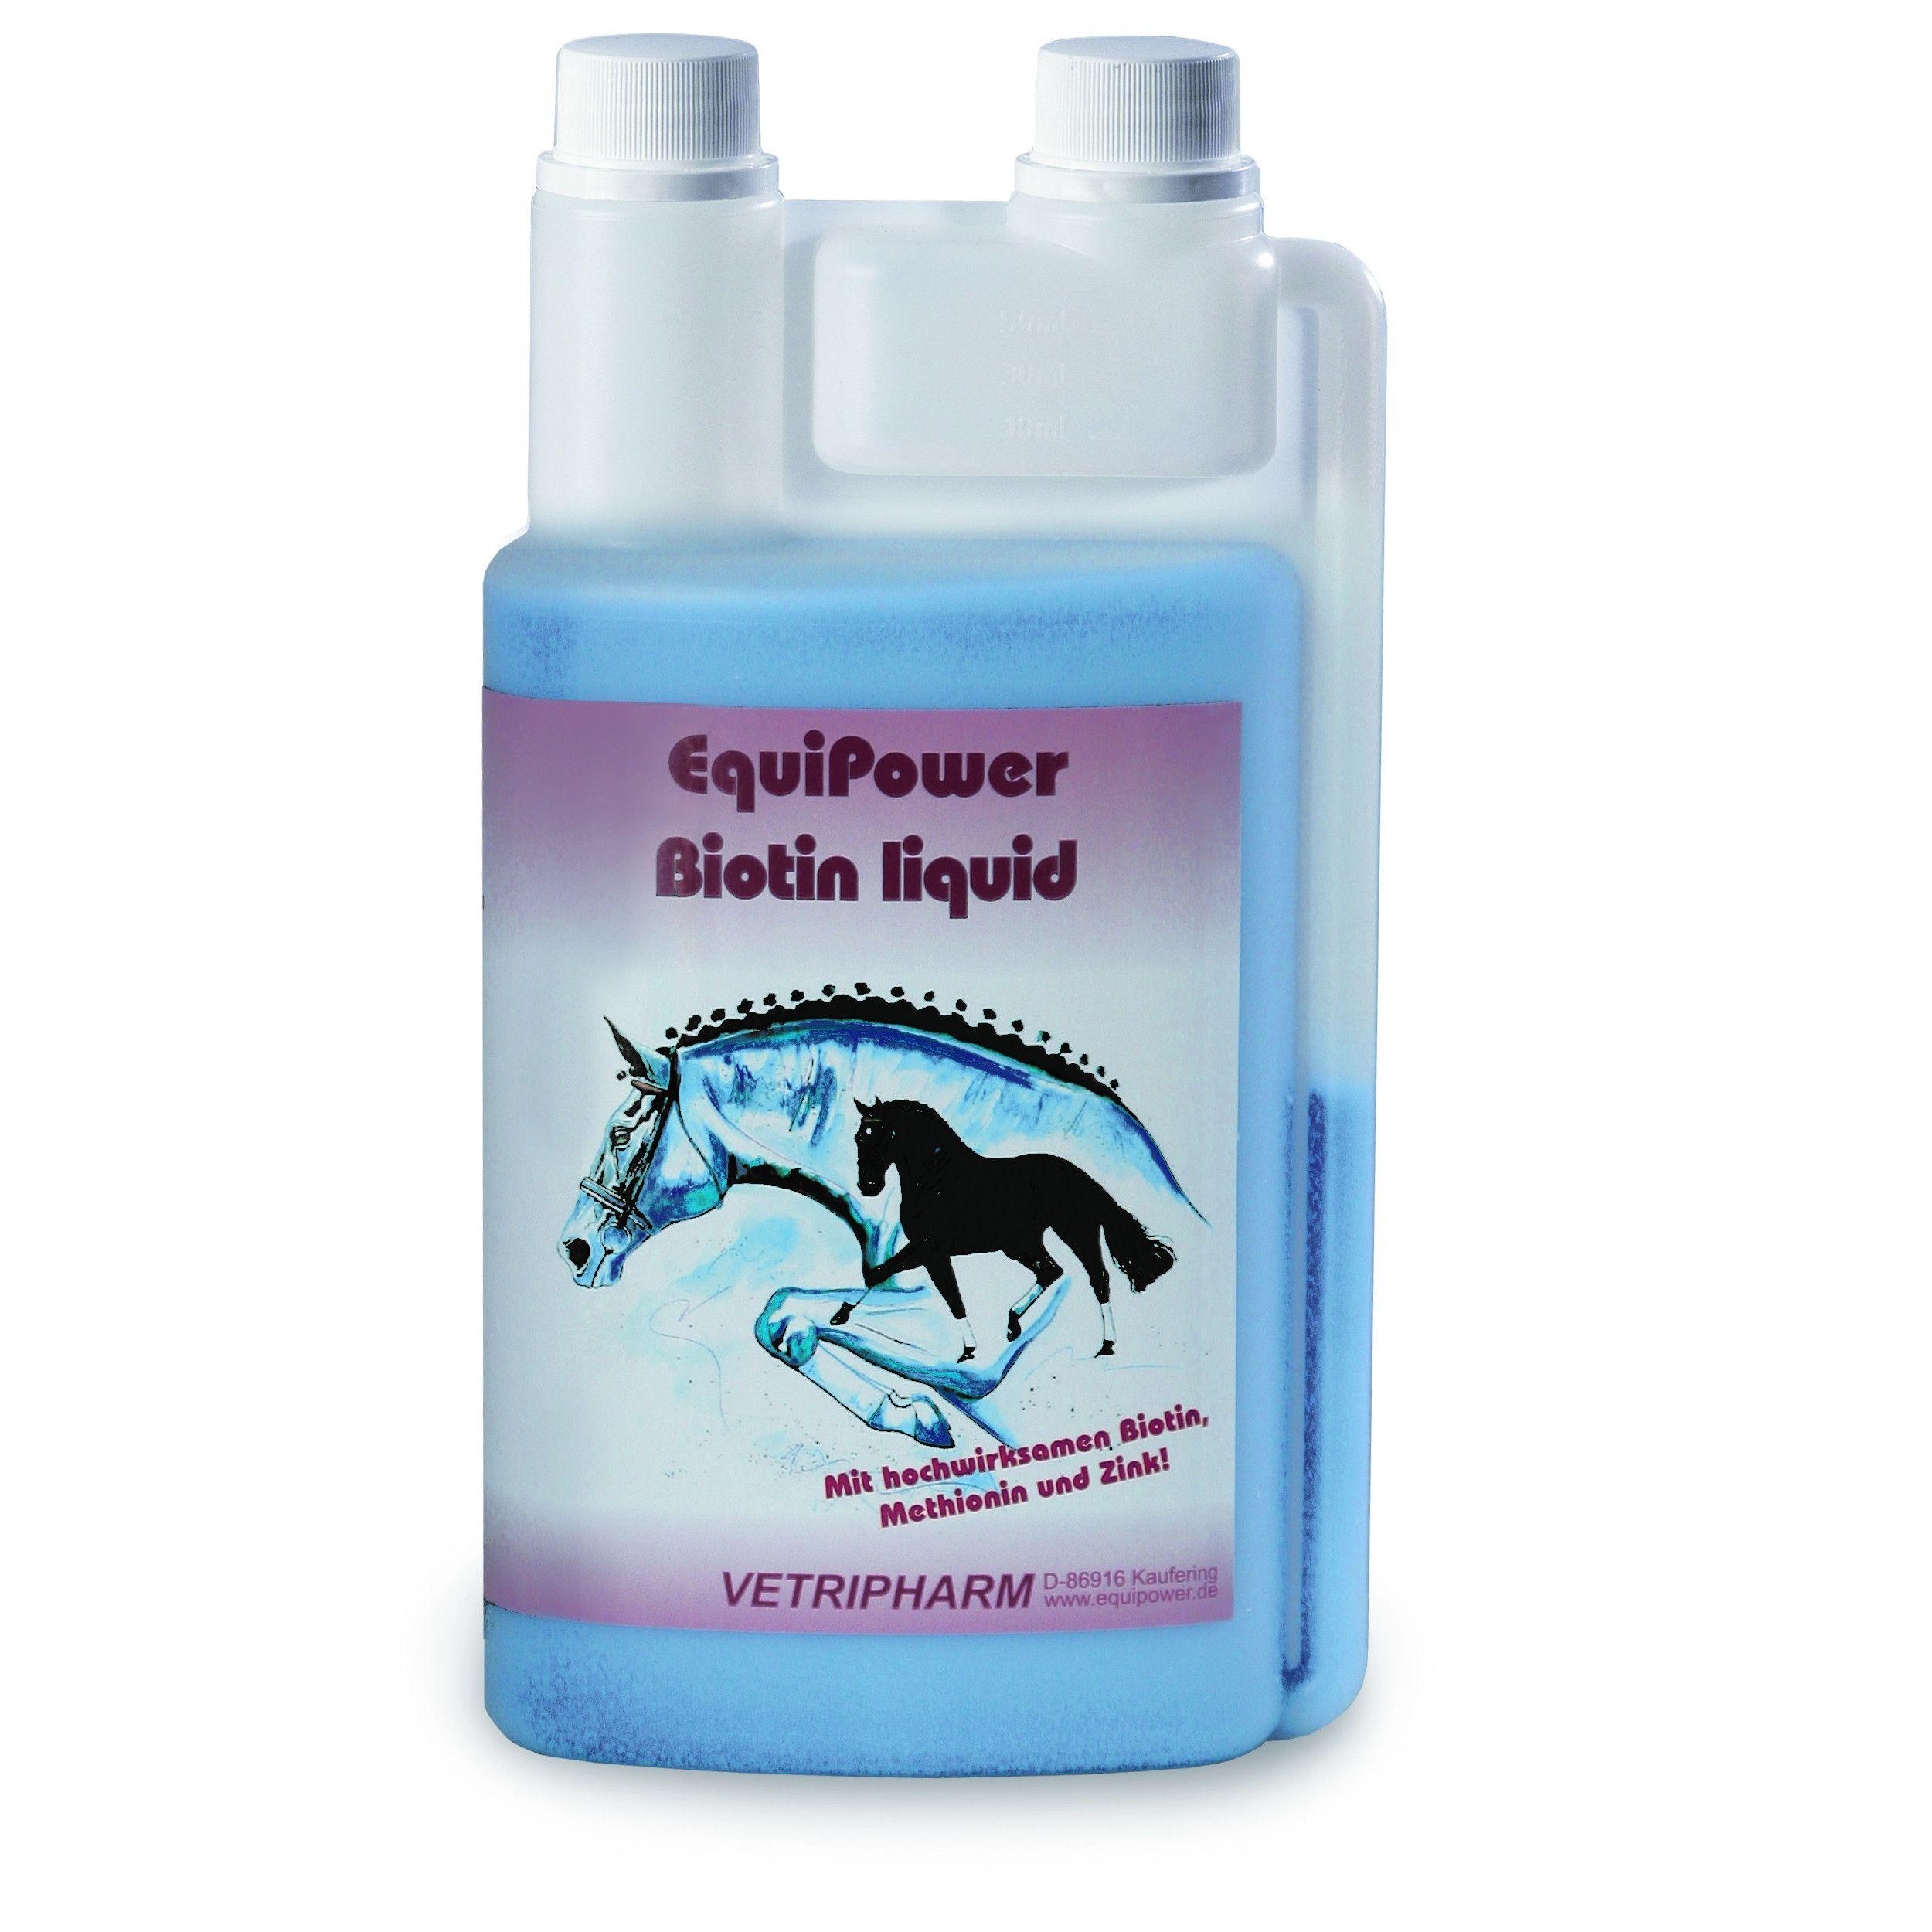 Vetripharm EquiPower Biotin liquid